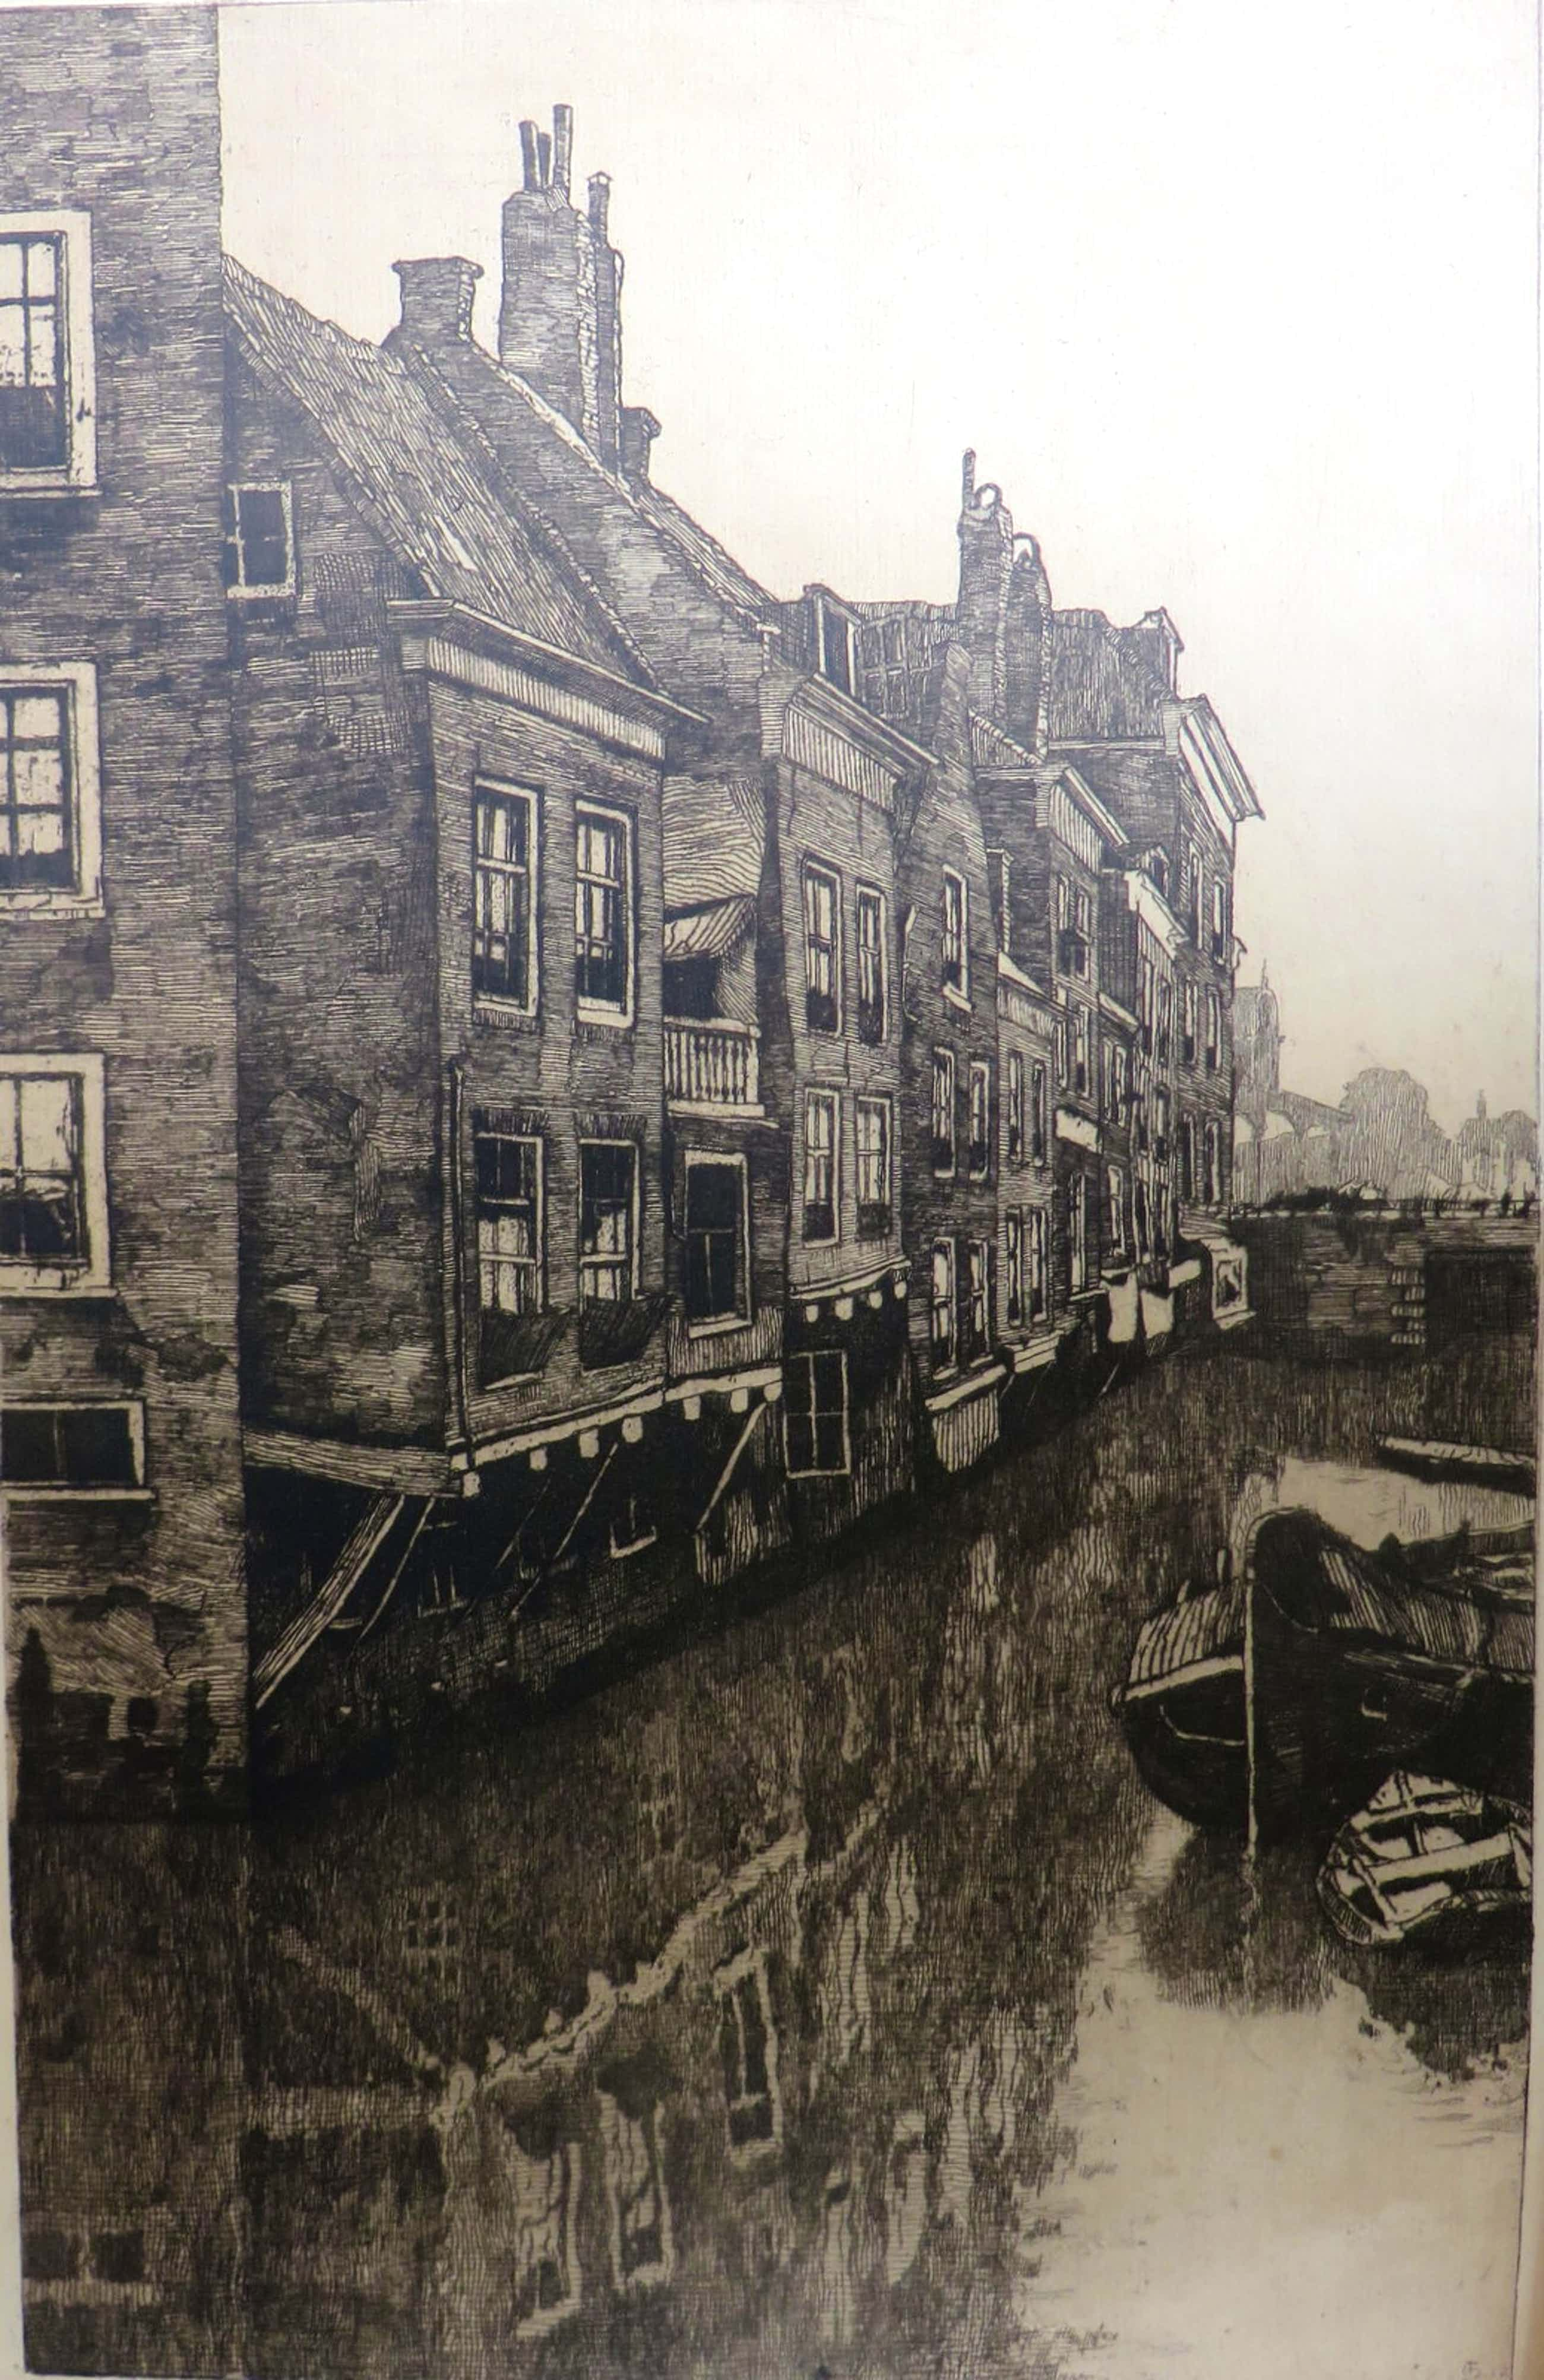 Jan Sirks - Rotterdams stadsgezicht met gracht kopen? Bied vanaf 50!